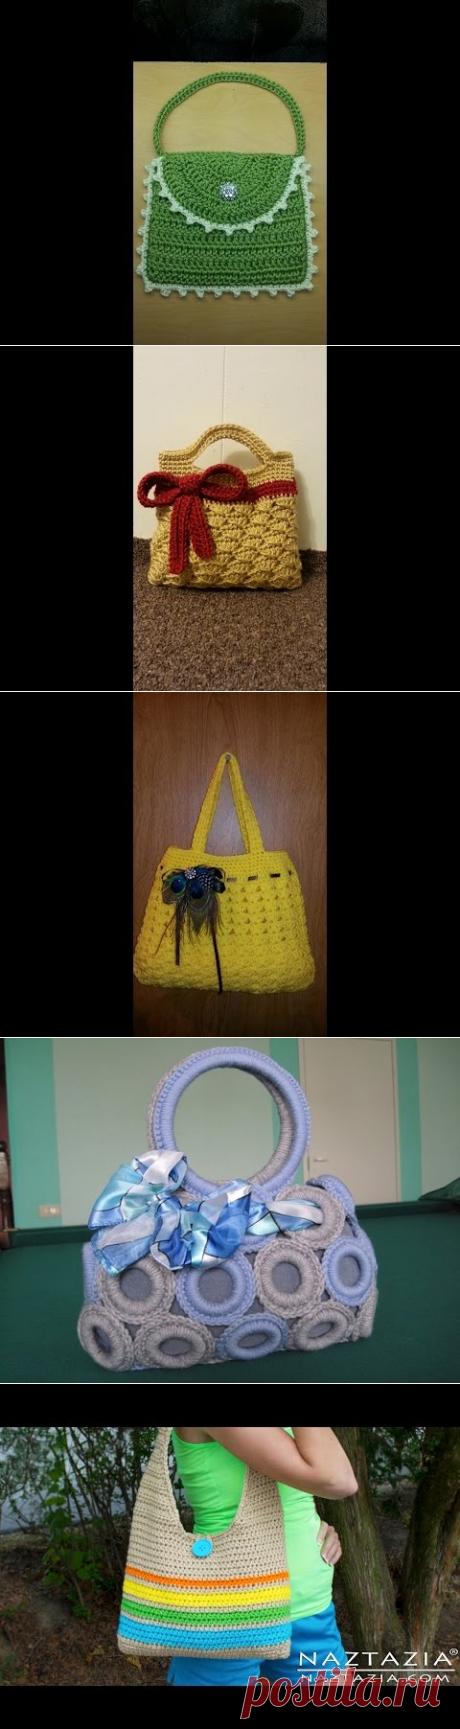 0f8f3e647cff DIY Learn How To Crochet Flower Purse Bag Clutch Handbag Wallet (and Line a  Purse